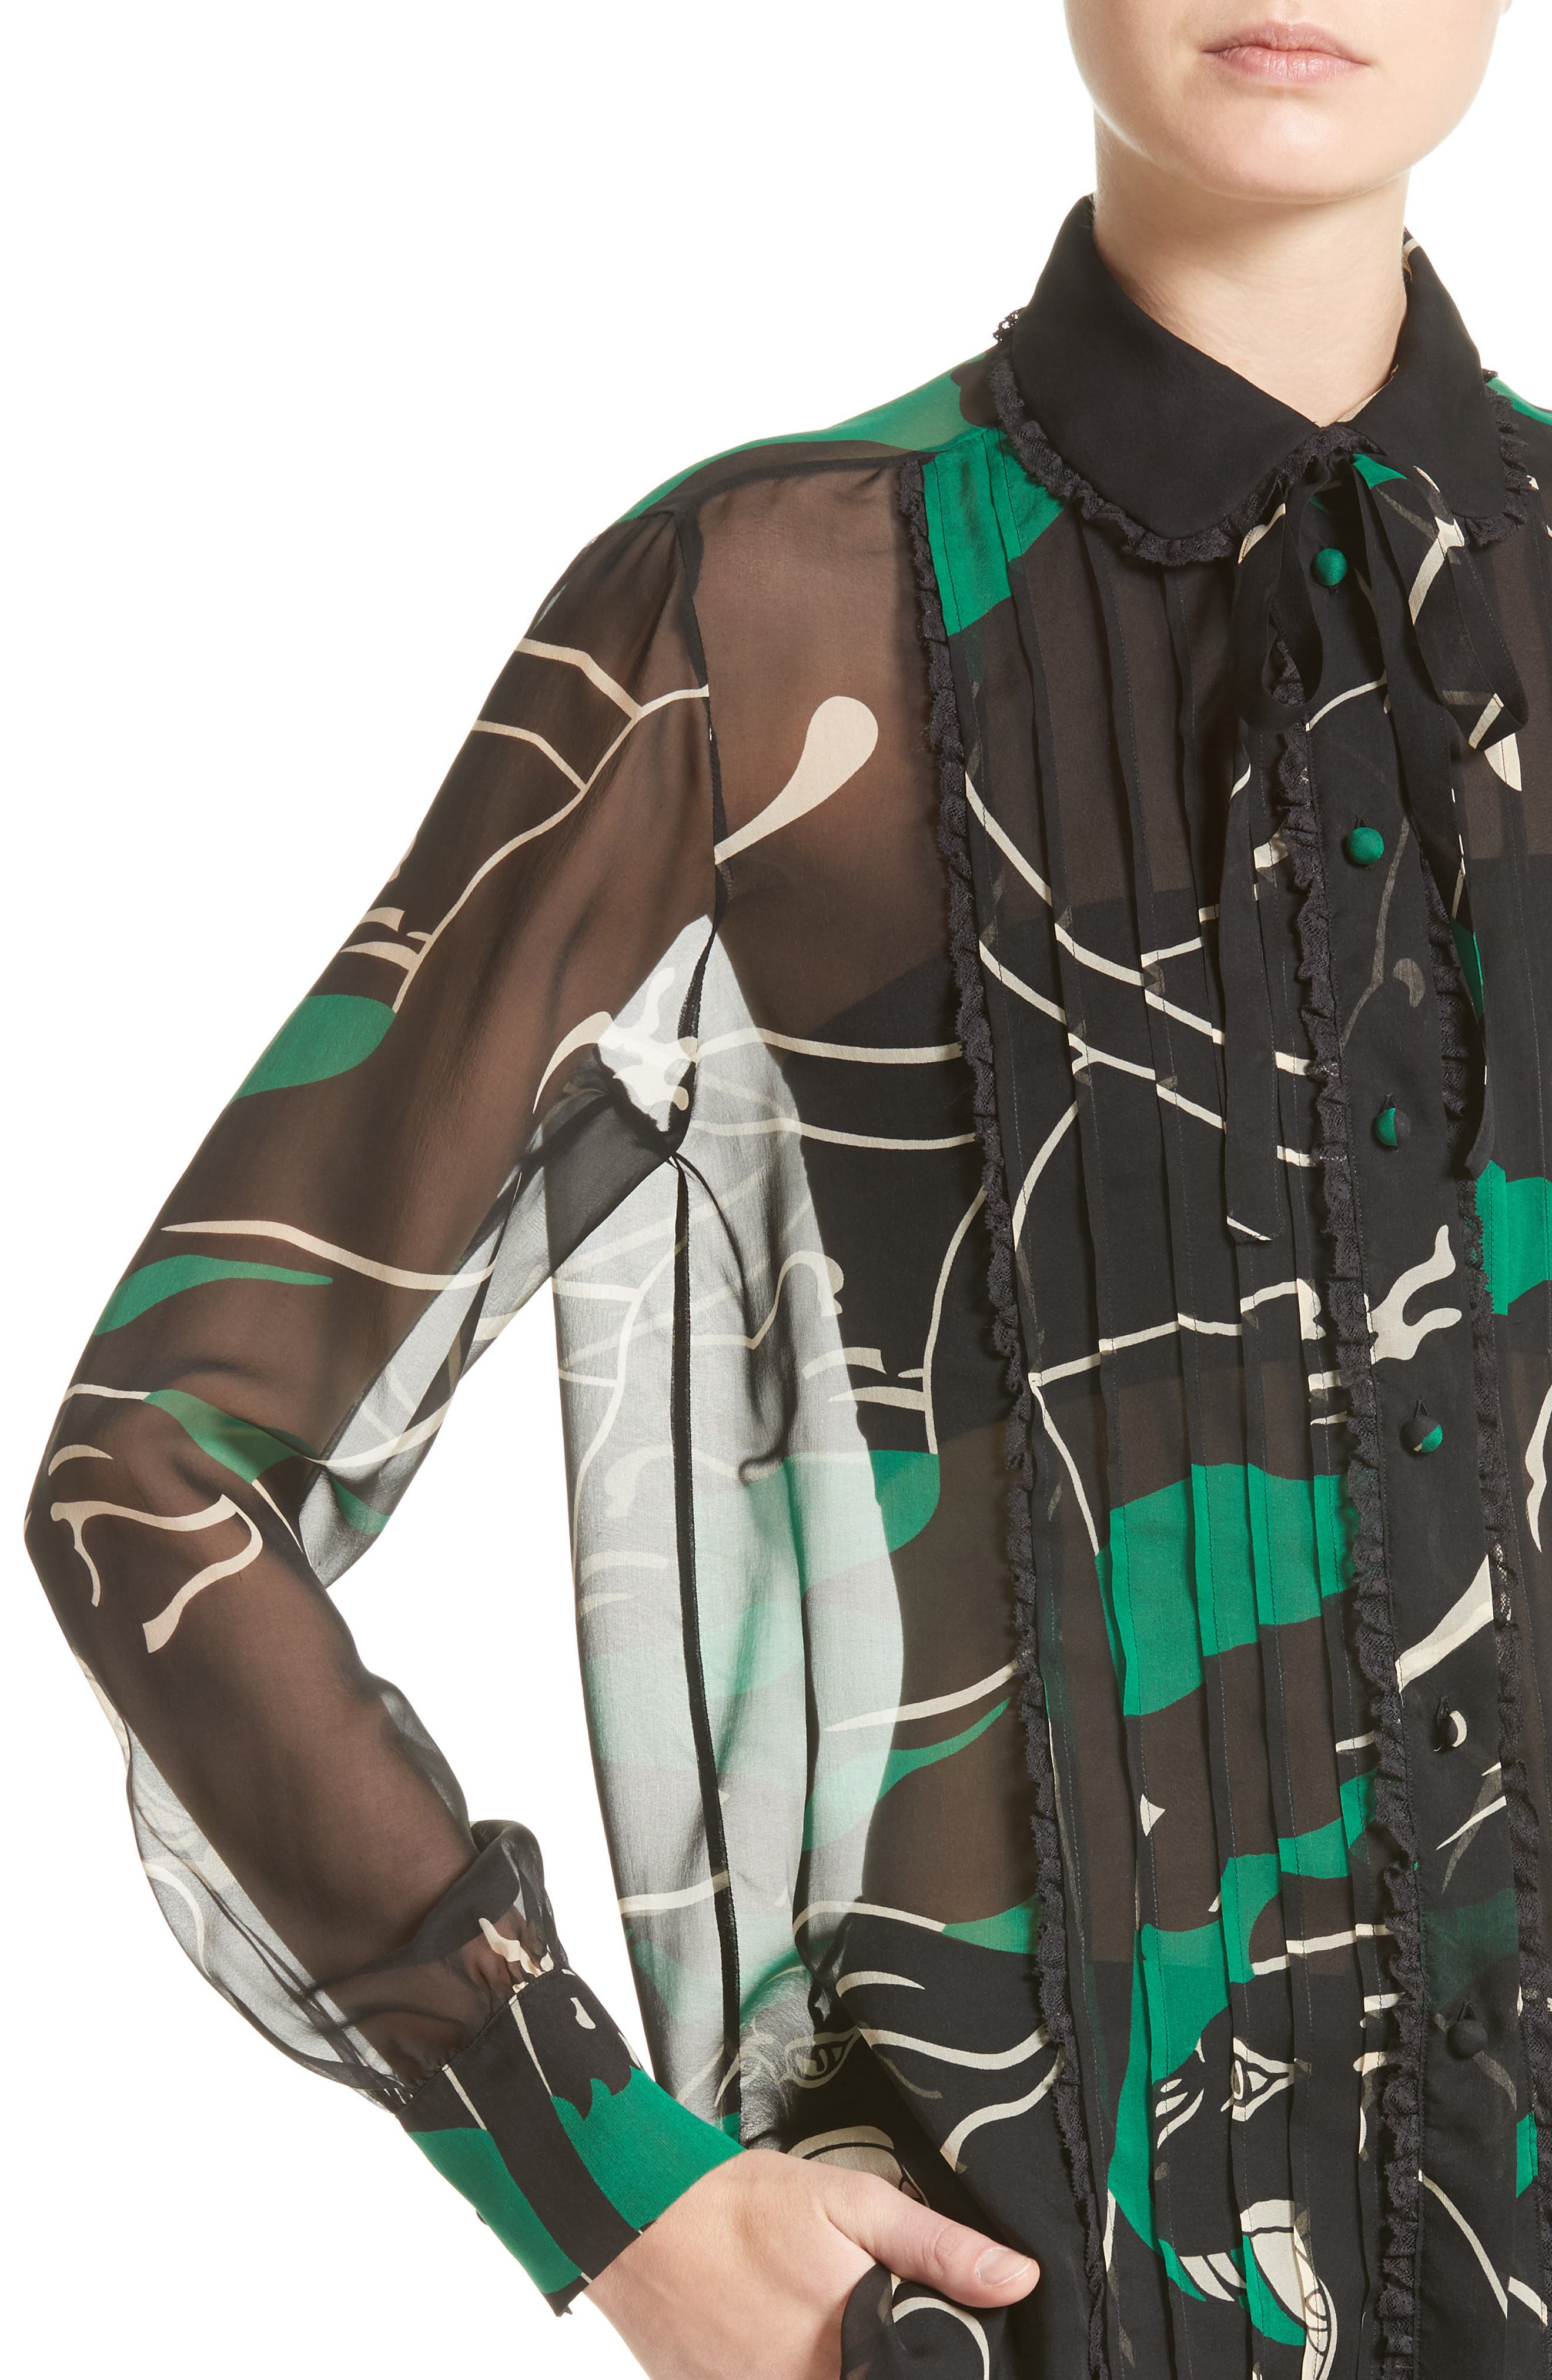 Panther Print Silk Chiffon Blouse,                             Alternate thumbnail 4, color,                             001